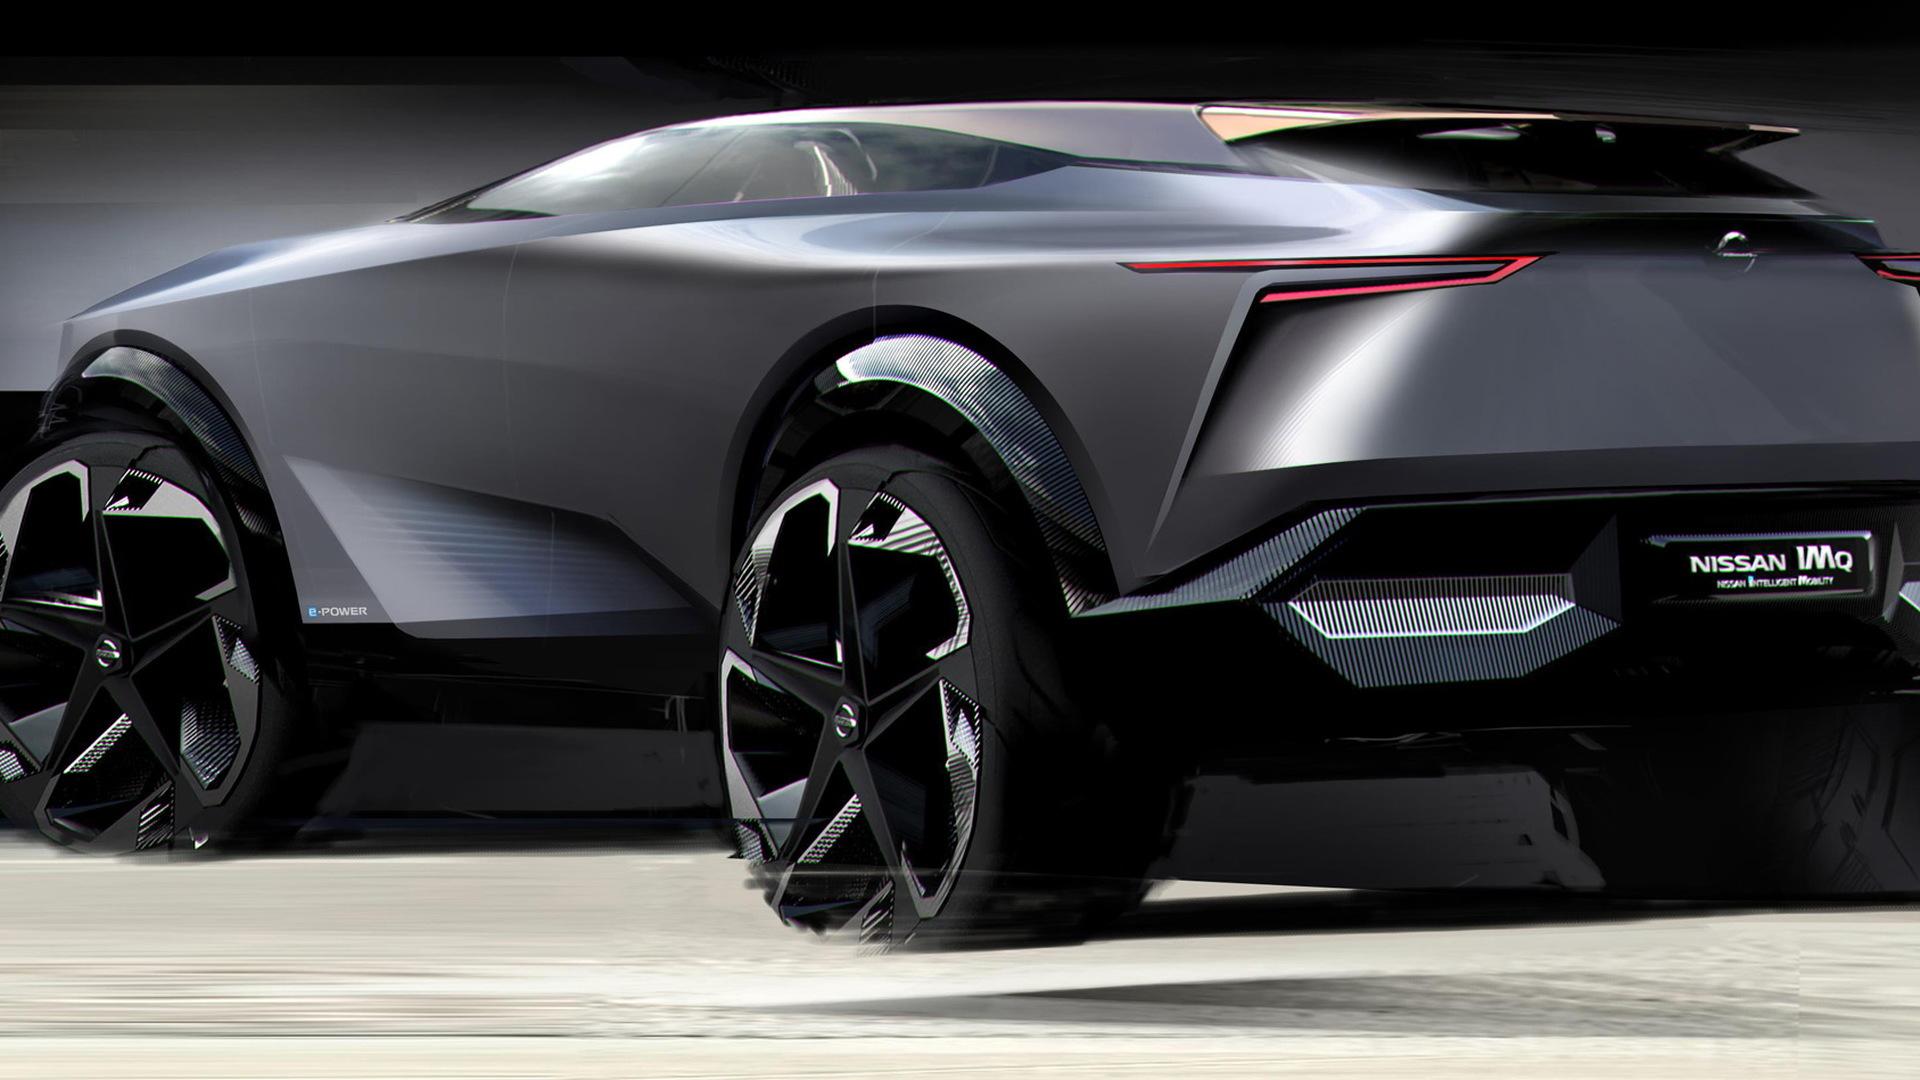 Nissan Imq Electric Suv Concept Bound For Geneva Auto Show